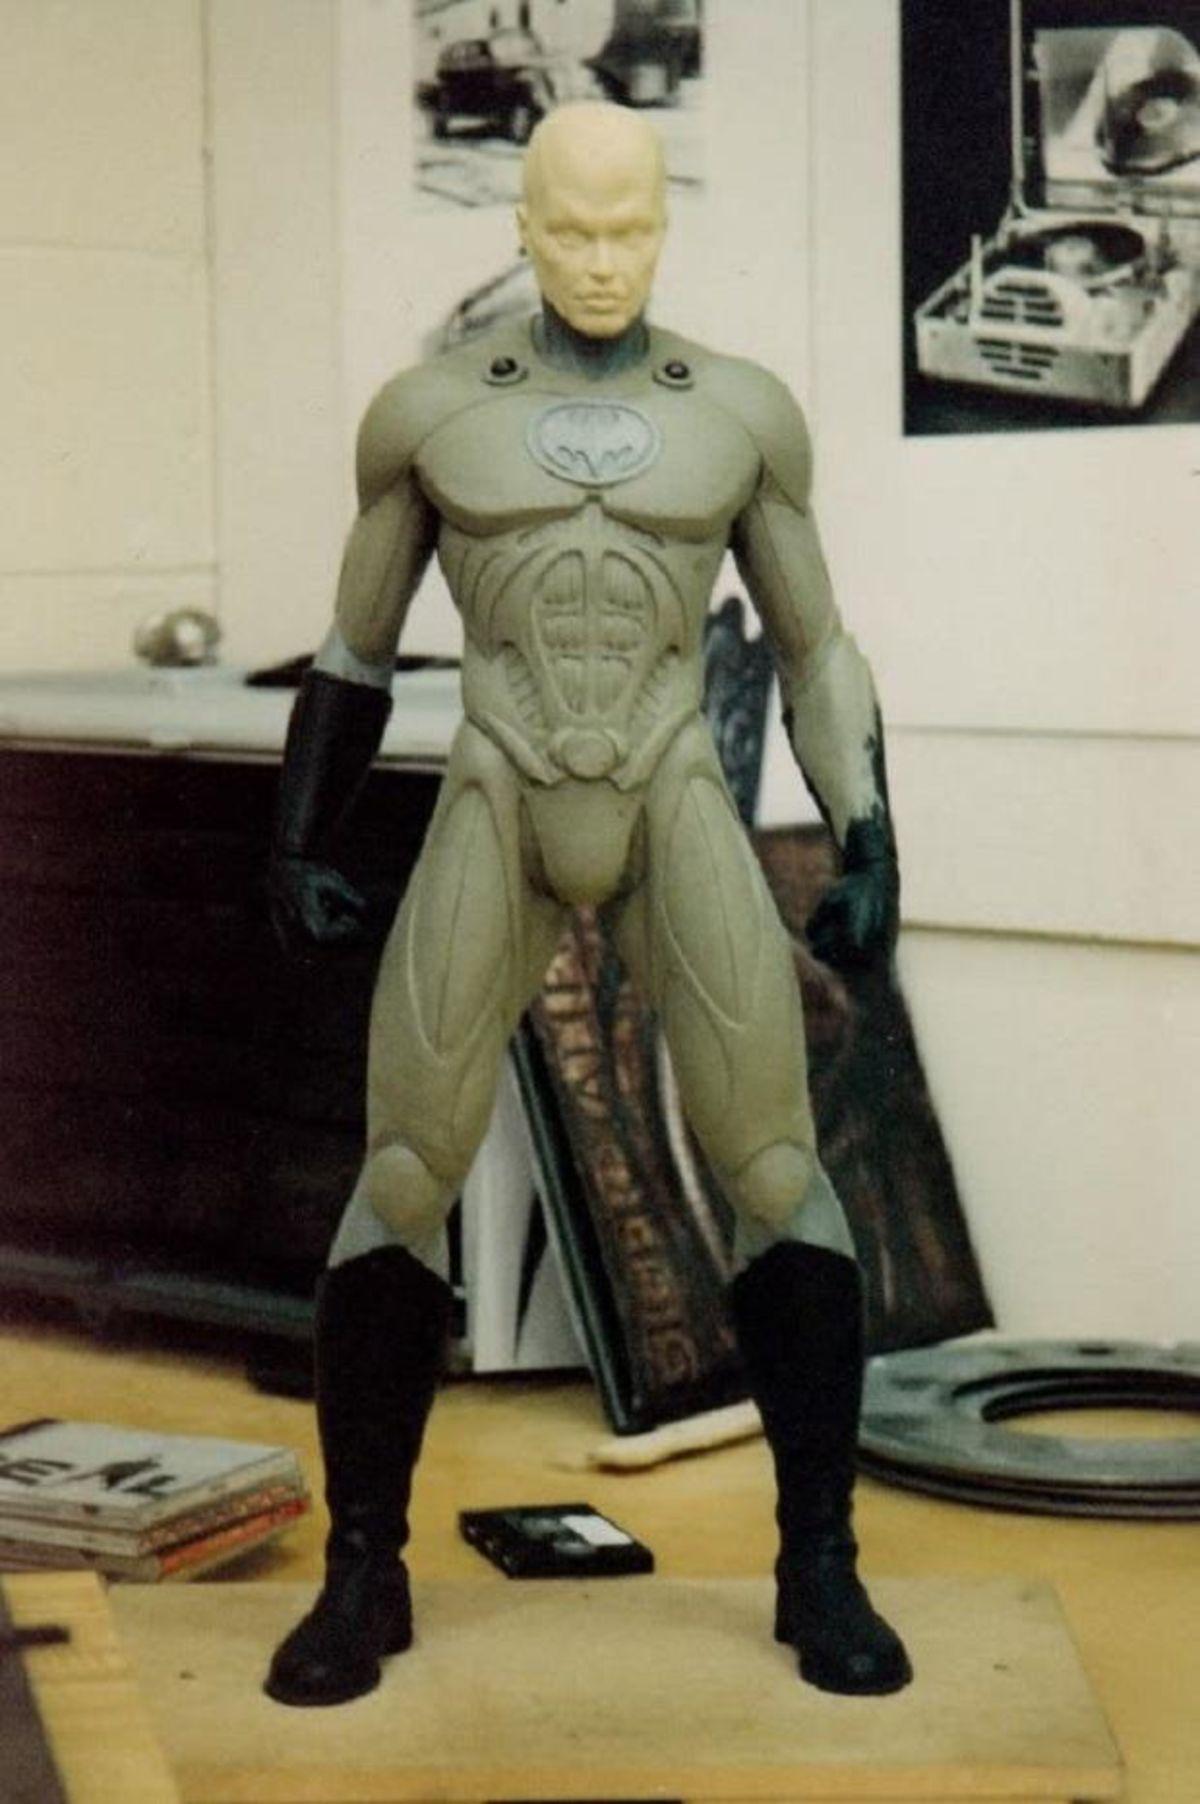 Prototipo del Batitraje no usado por Michael Keaton en una tercera película de Batman. Imagen: Mindd Kidzag Twitter (@MinddKidzag).